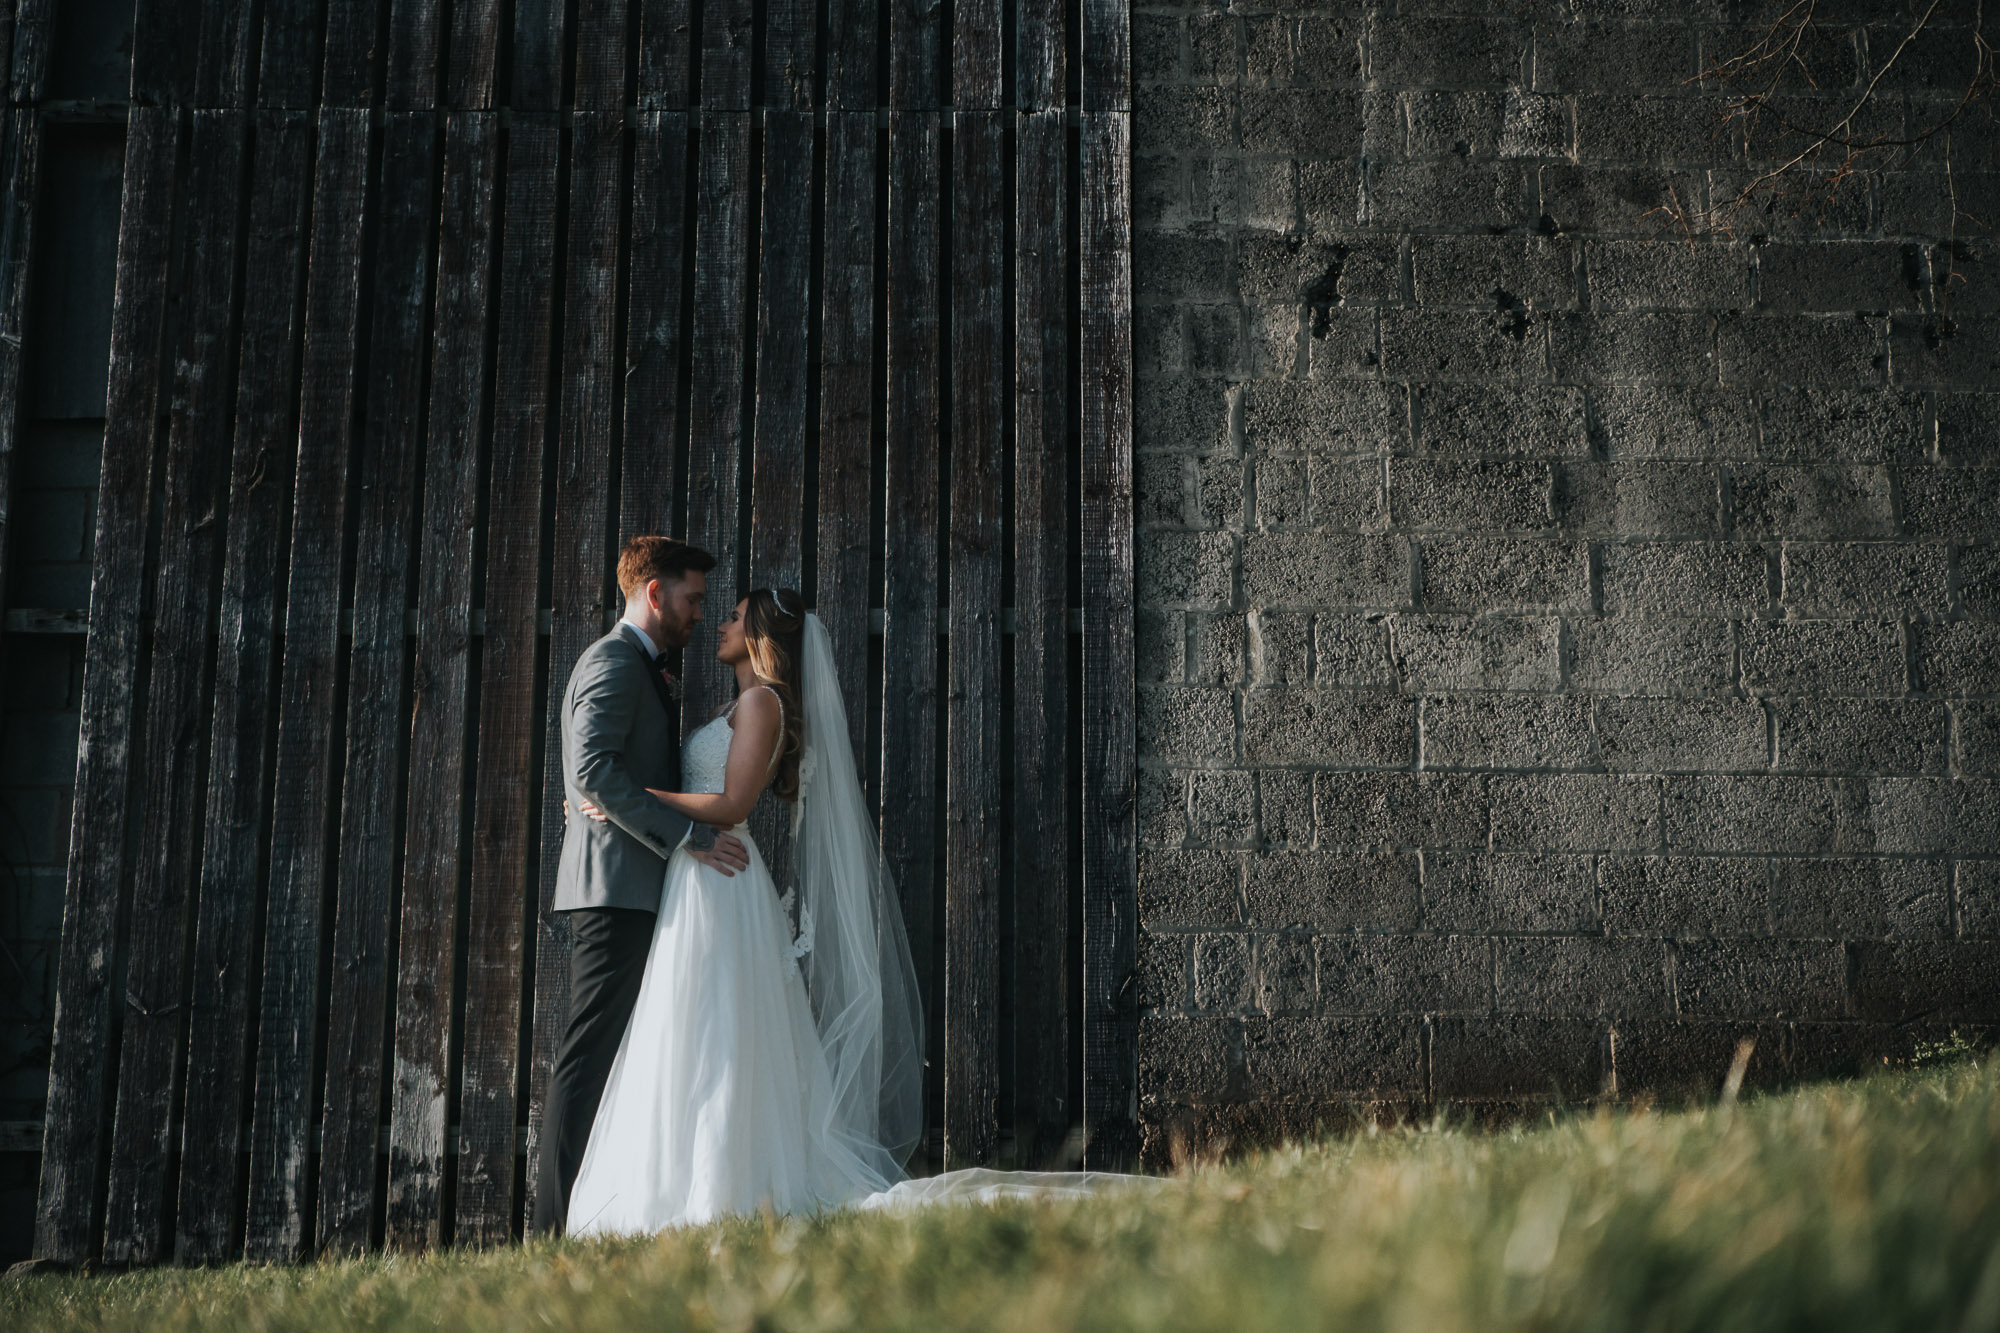 West Tower Exclusive Wedding Venue wedding photography merseyside and lancashire wedding photographer (42 of 60).jpg